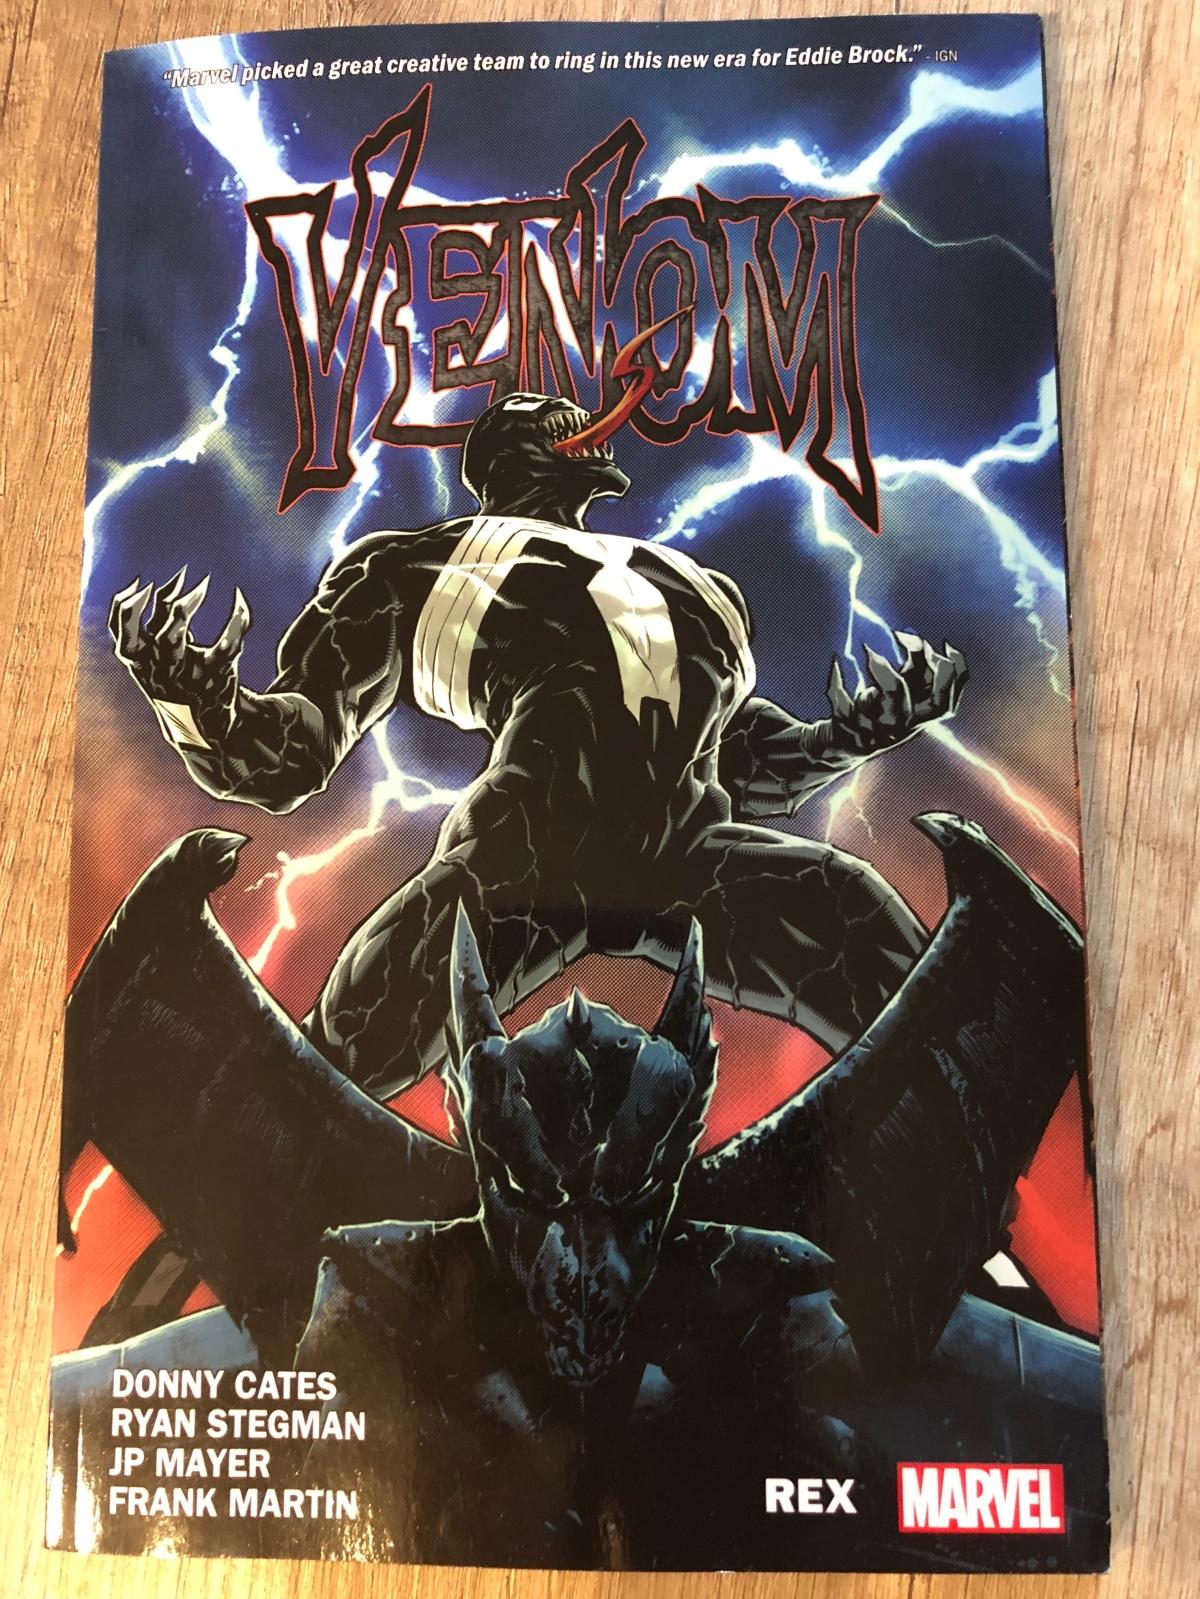 Venom by Donny Cates Vol. 1: Rex |Review